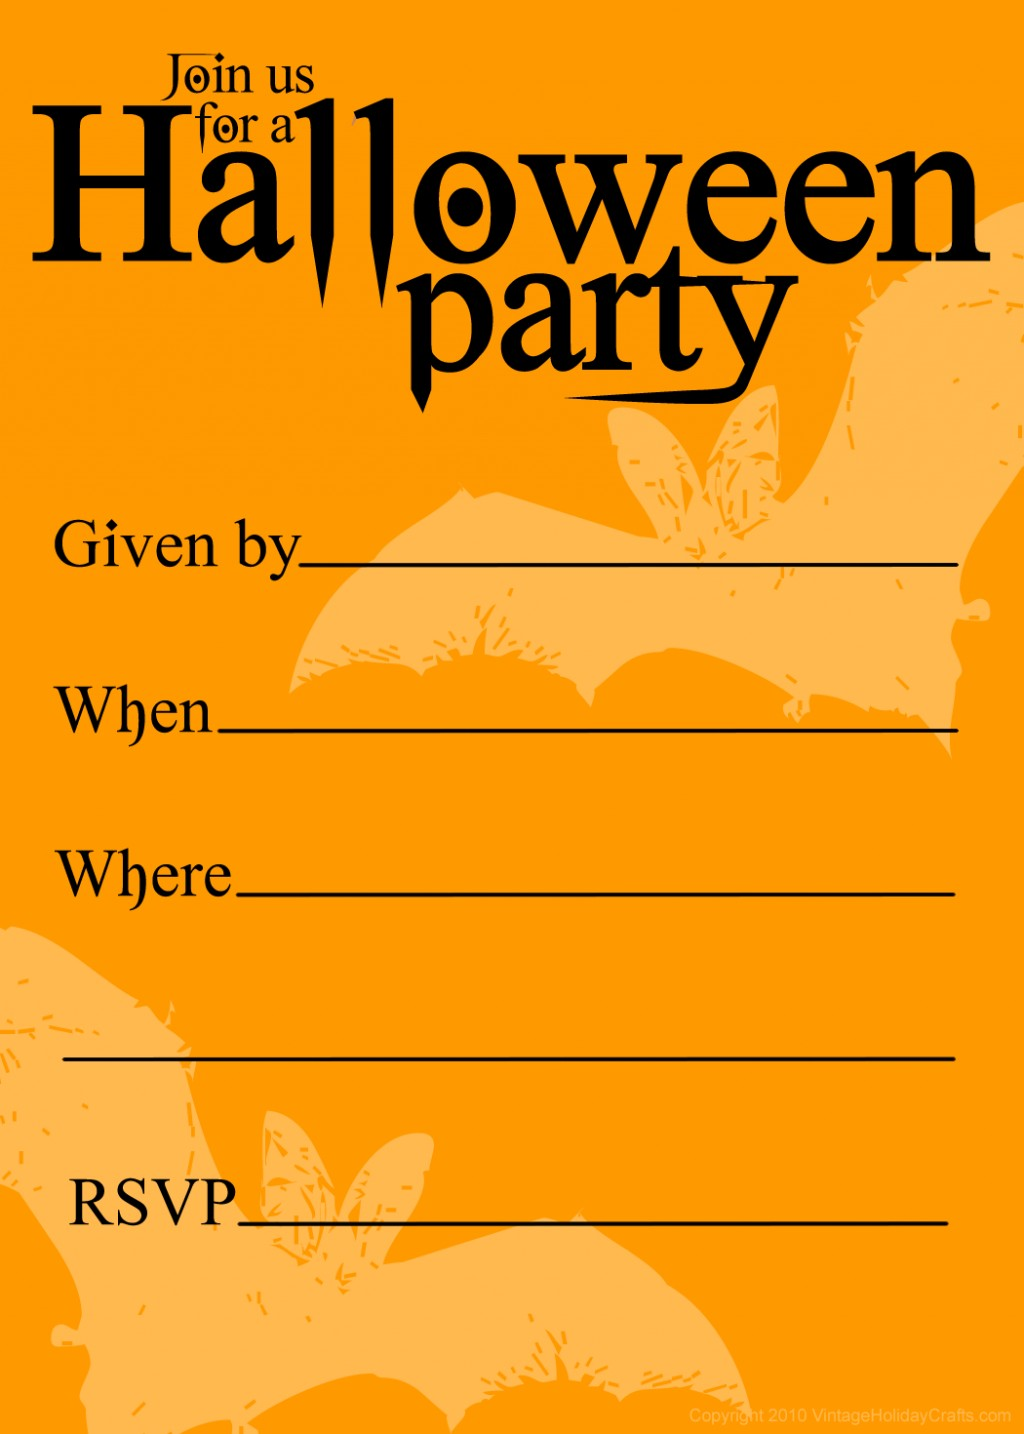 Halloween Party Invitation Clipart. Snowjet.co.